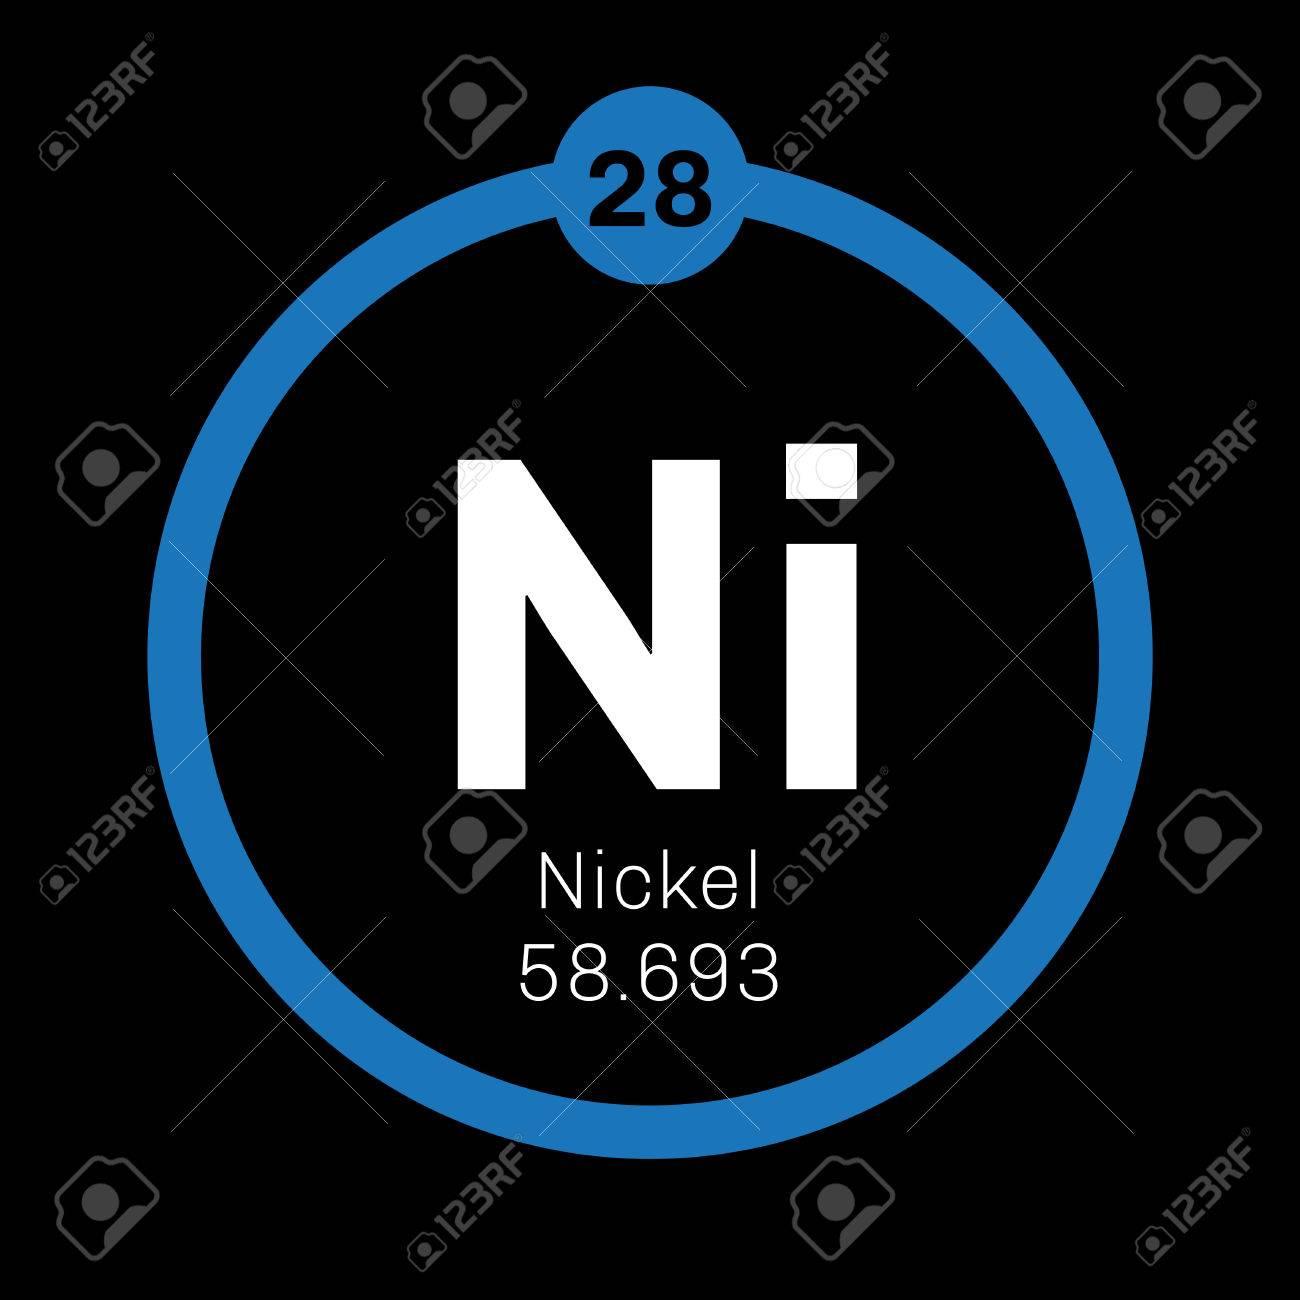 Nickel chemical element transition metal colored icon with nickel chemical element transition metal colored icon with atomic number and atomic weight urtaz Choice Image